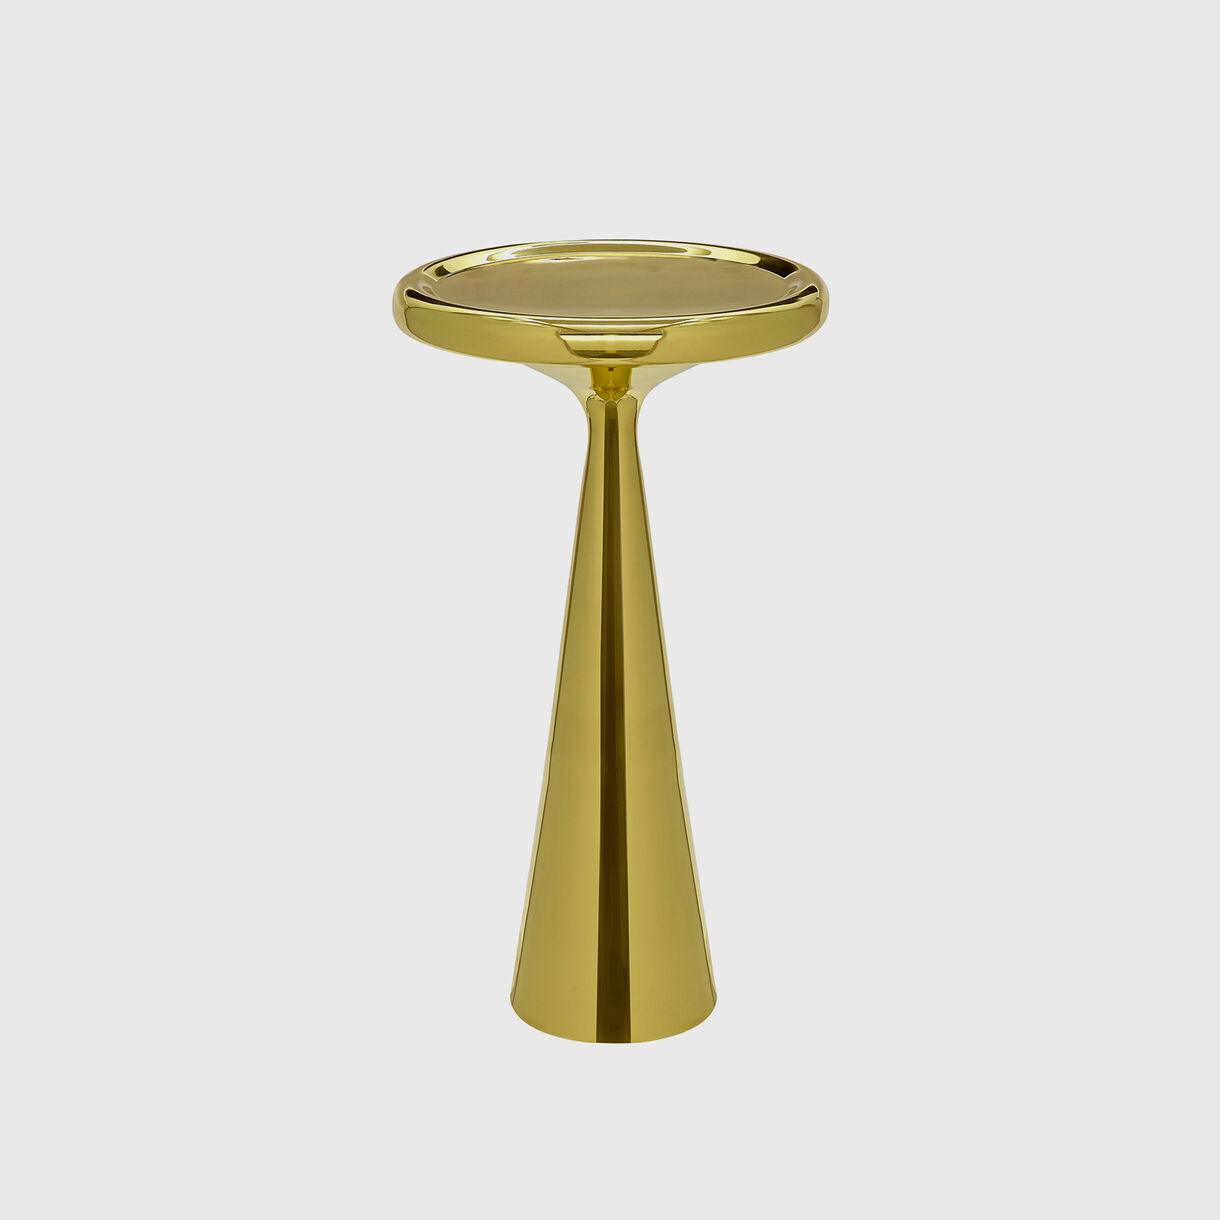 Spun Table, Tall